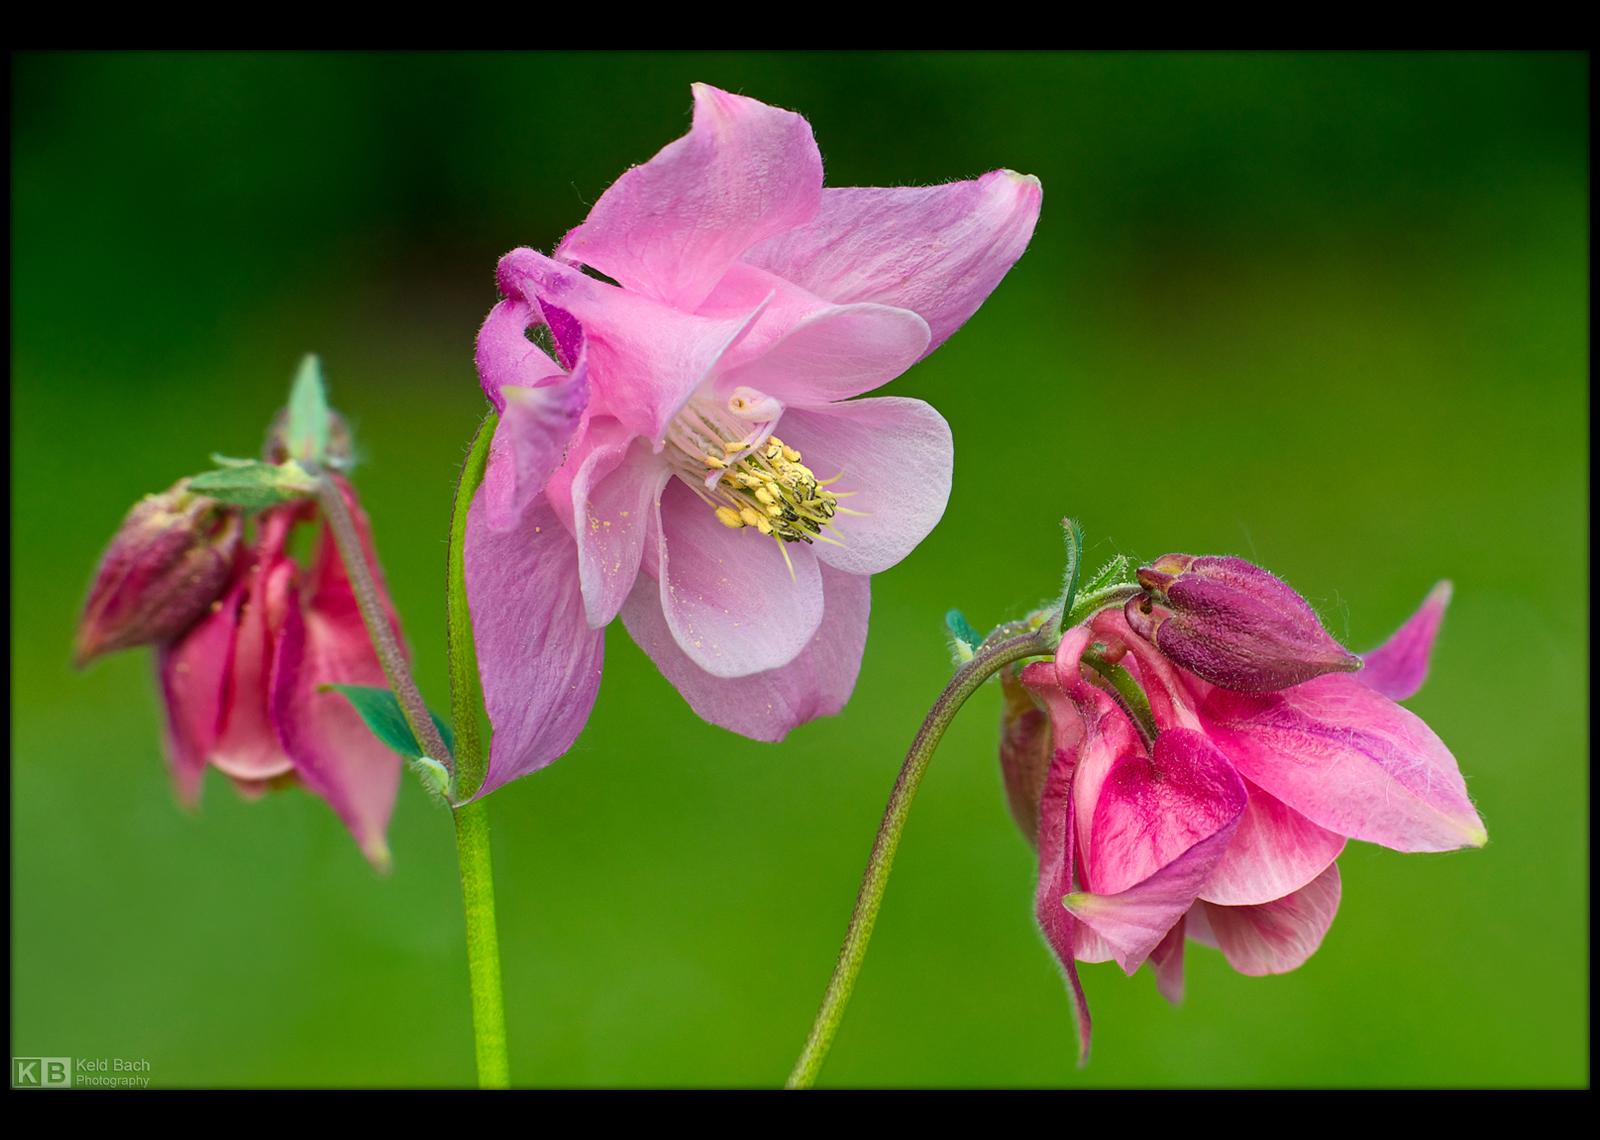 Pinkish Columbine by KeldBach